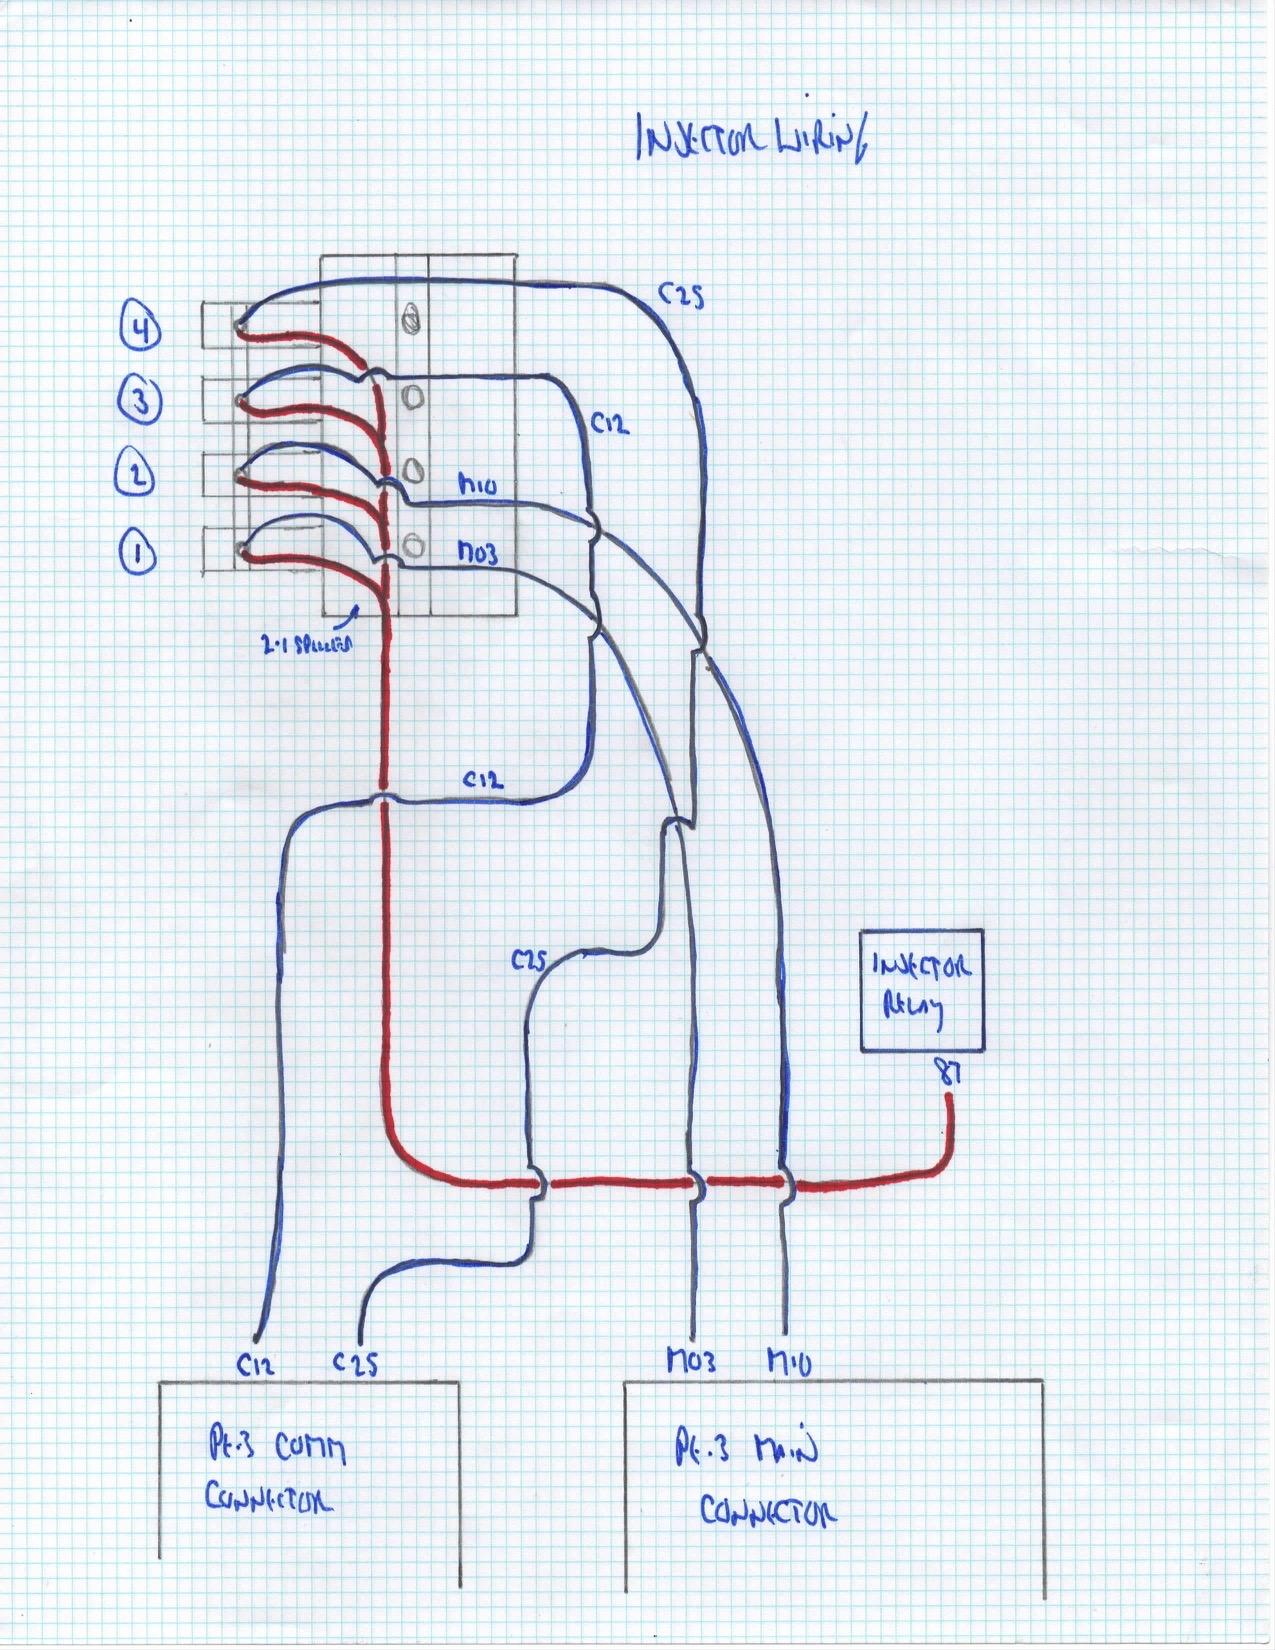 ➤ Diagram Fuse Box Diagram 1997 Mack Cl713 on 2000 kenworth t800 wiring diagram, 2000 kenworth w900 wiring diagram, 2000 mack ch613 wiring diagram,